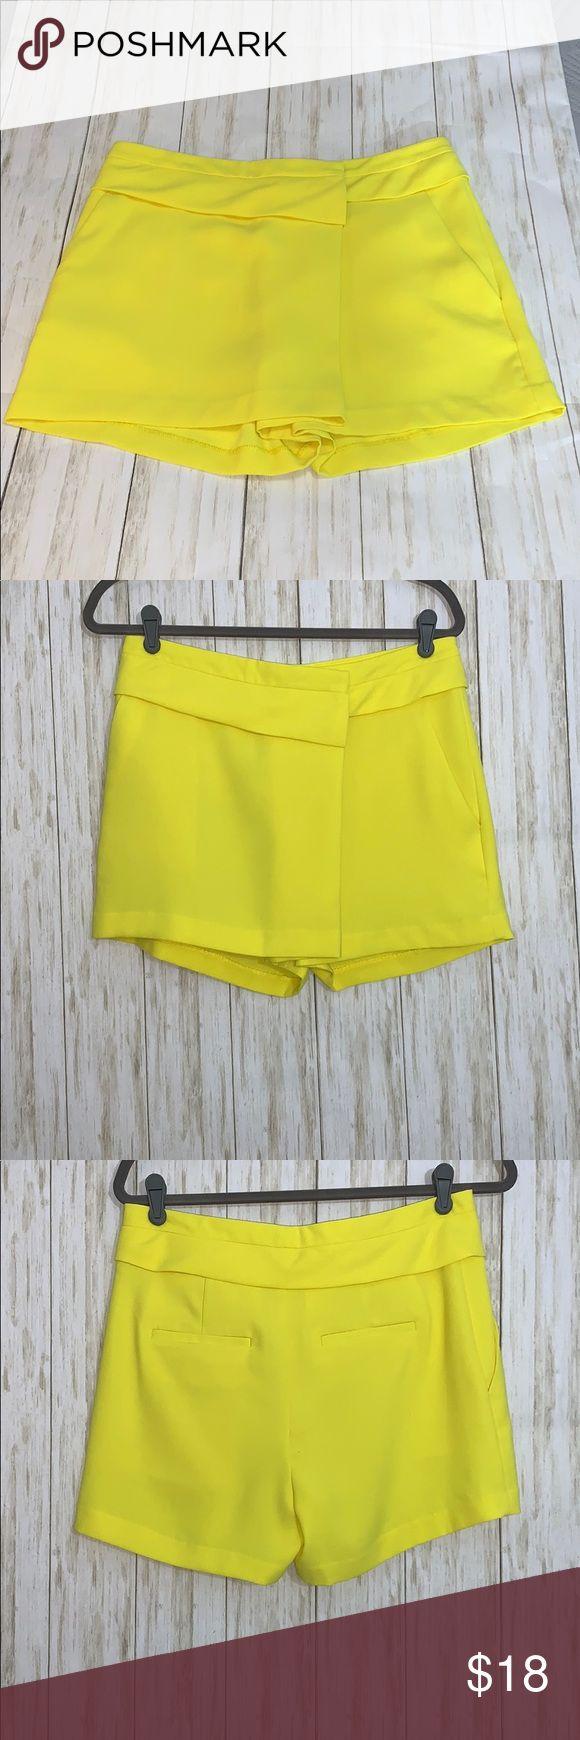 Sz4 Banana Republic Factory Bright Yellow Shorts in 2020